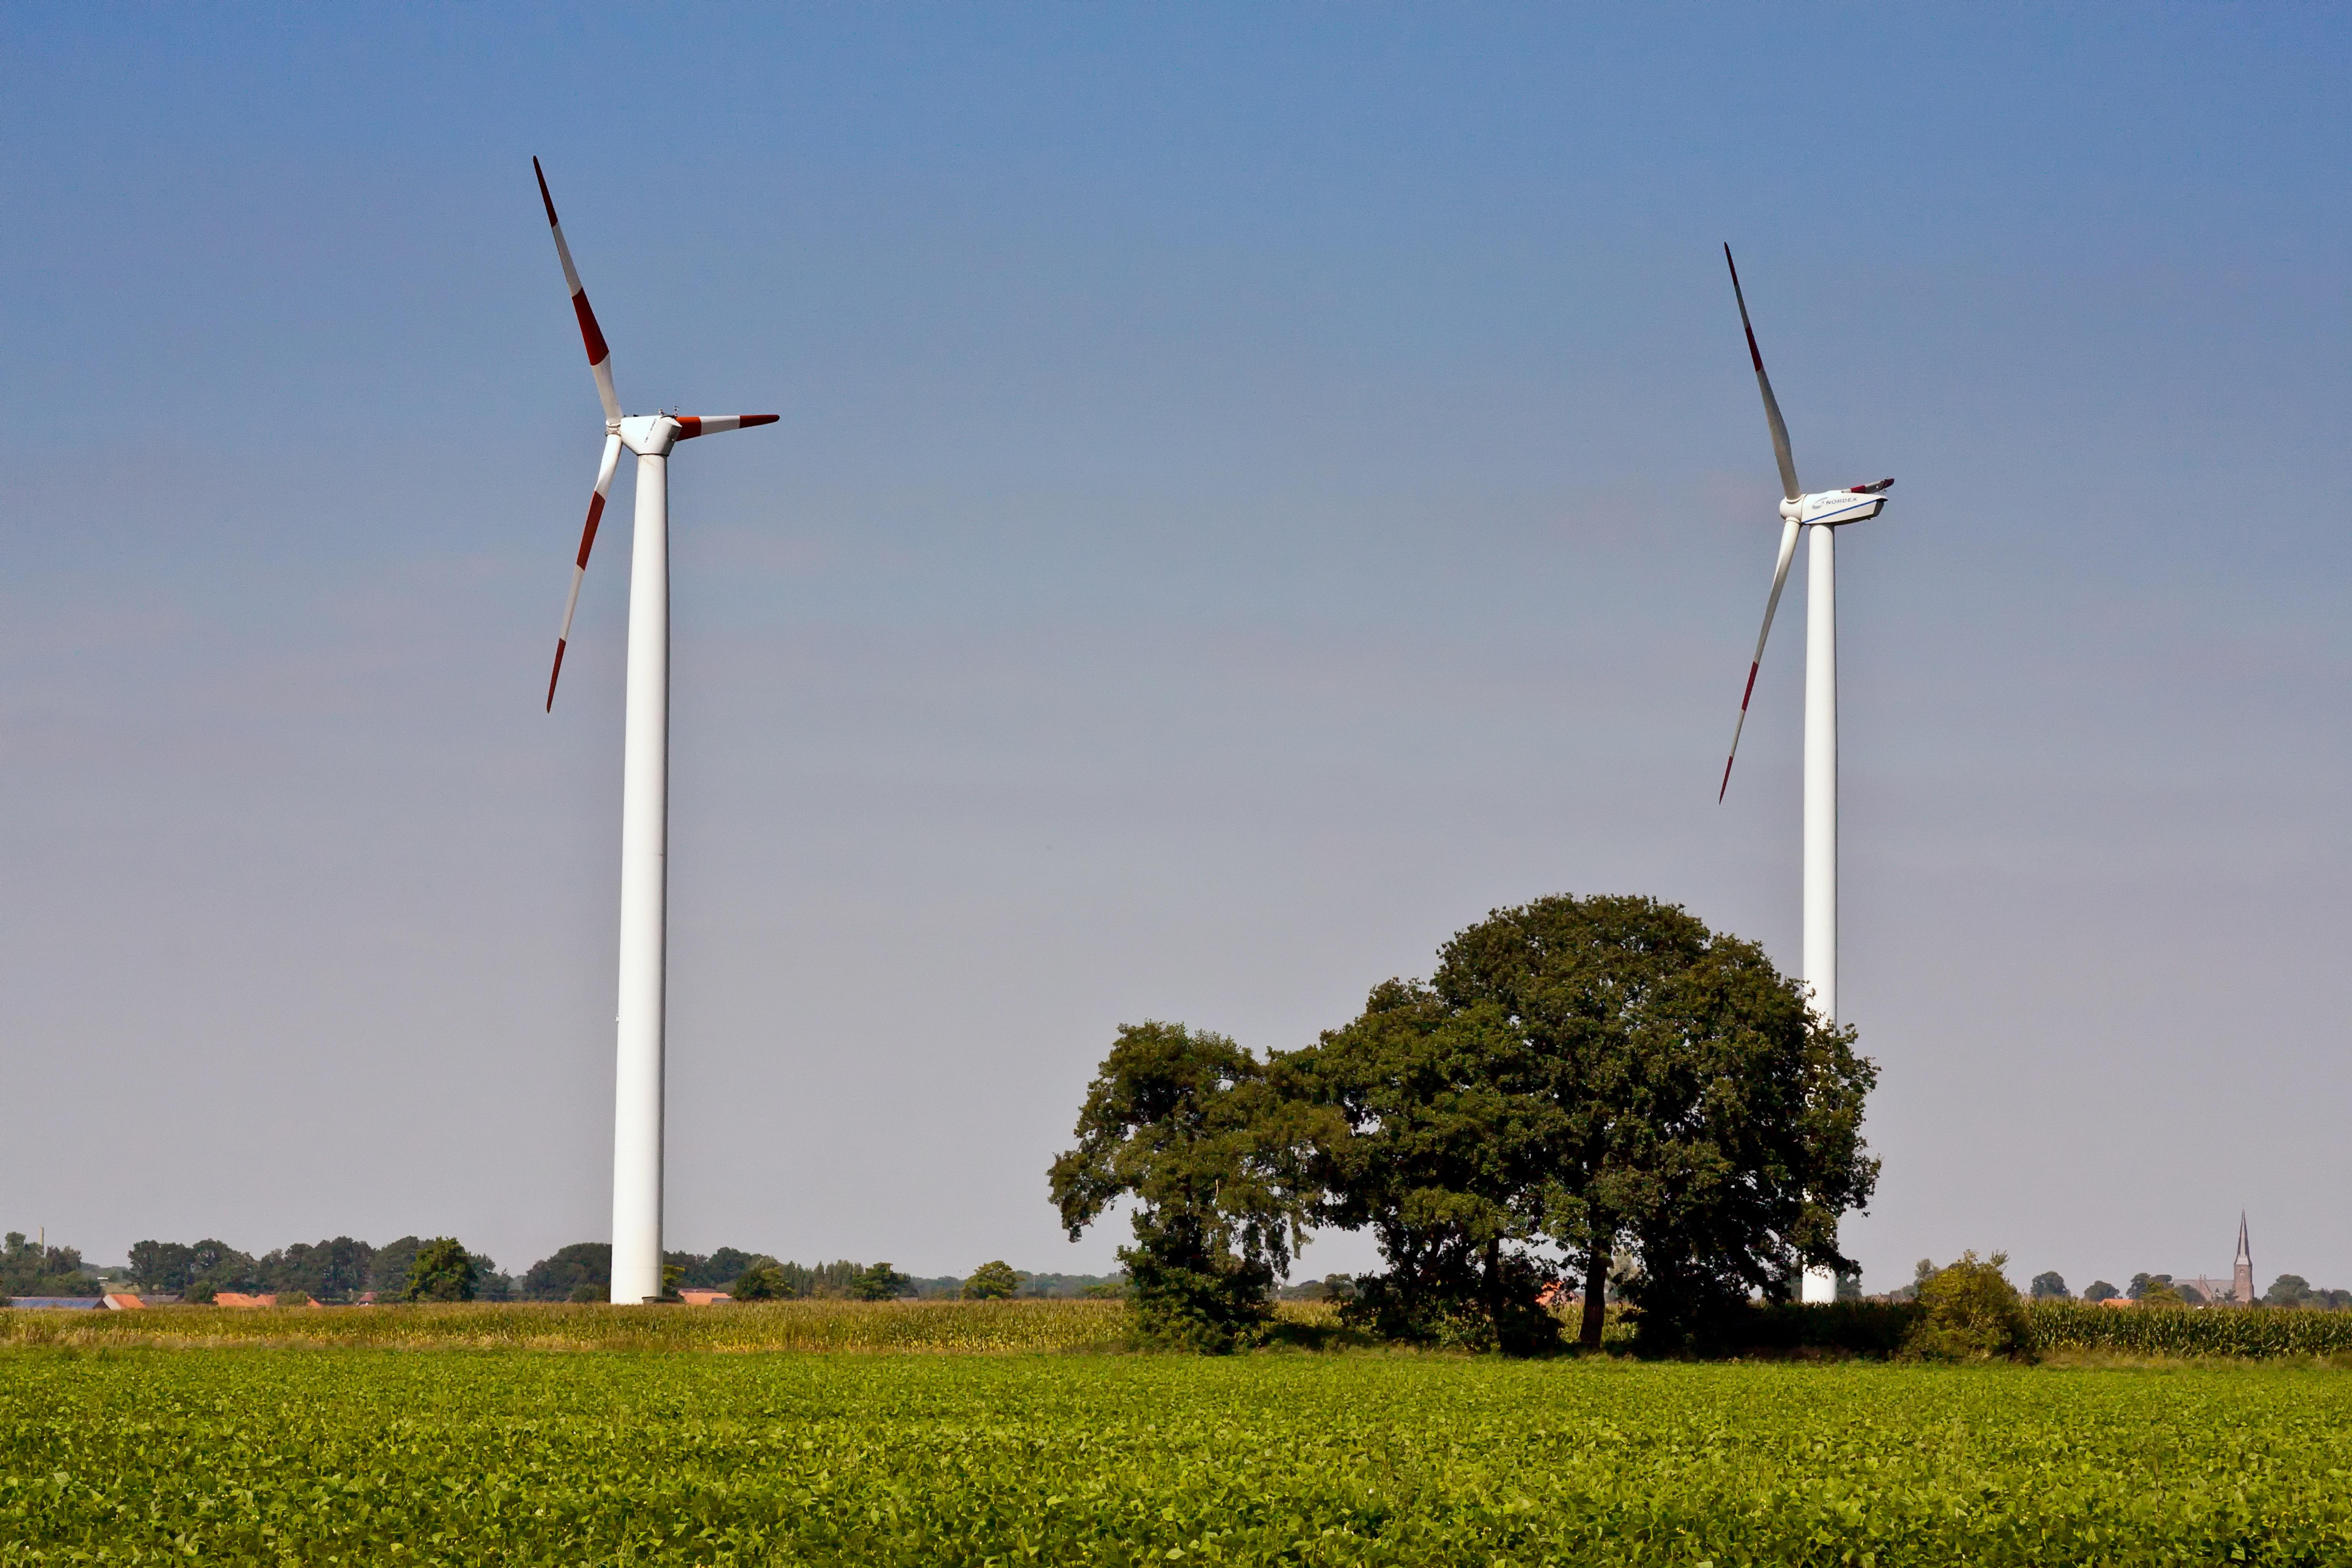 Free landscape sky sun field windmill environment